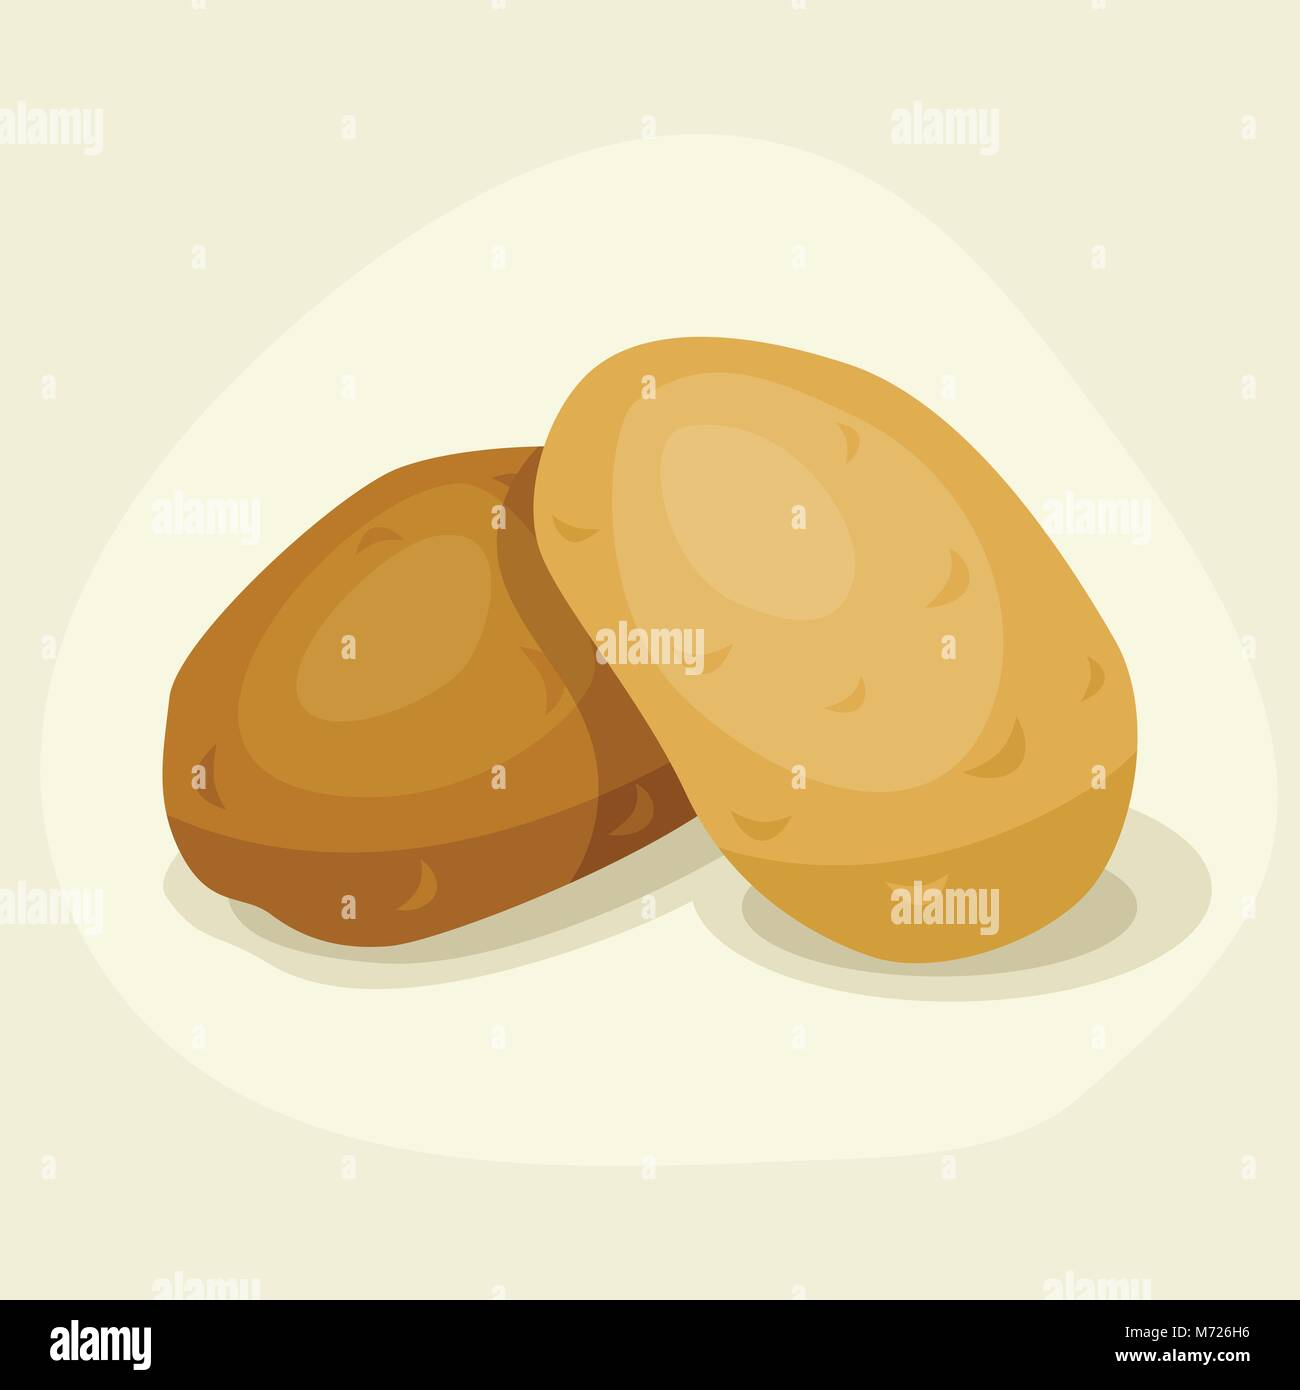 Stylized vector illustration of fresh ripe potatoes - Stock Vector